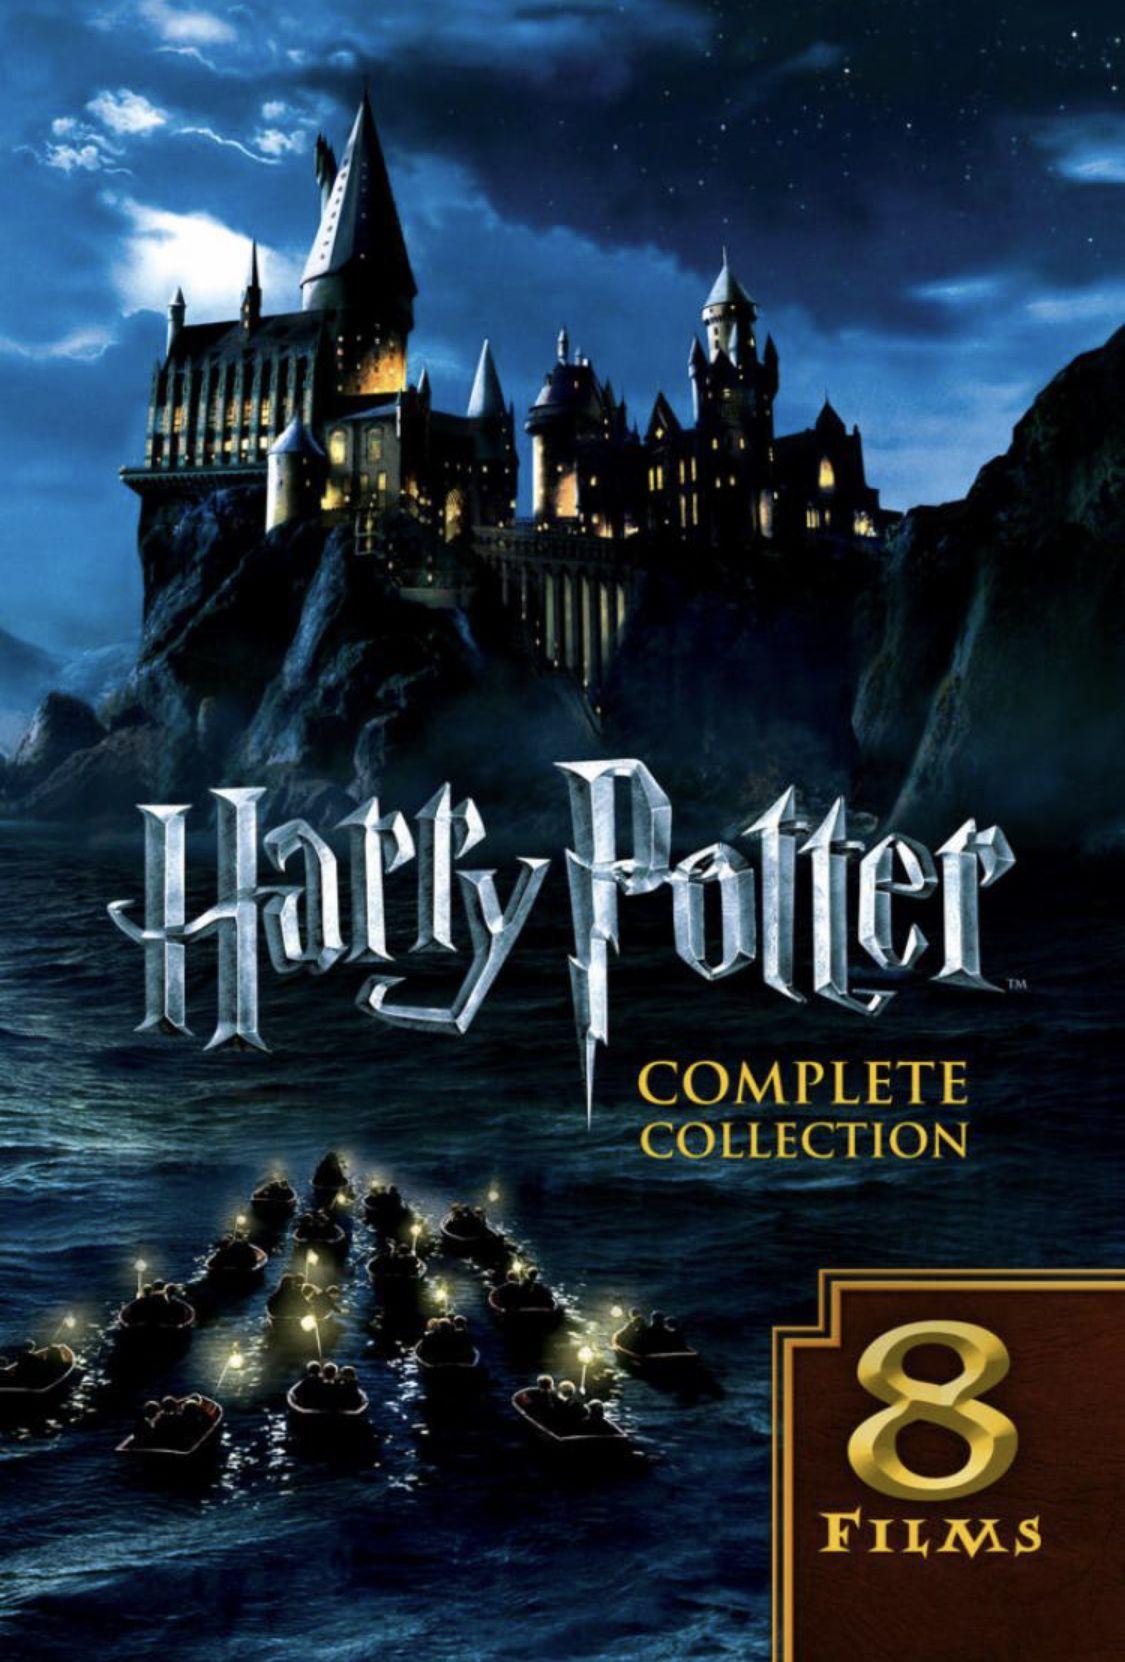 All 8 Harry Potter Films 58 Off 49 99 Harry Potter Dvd